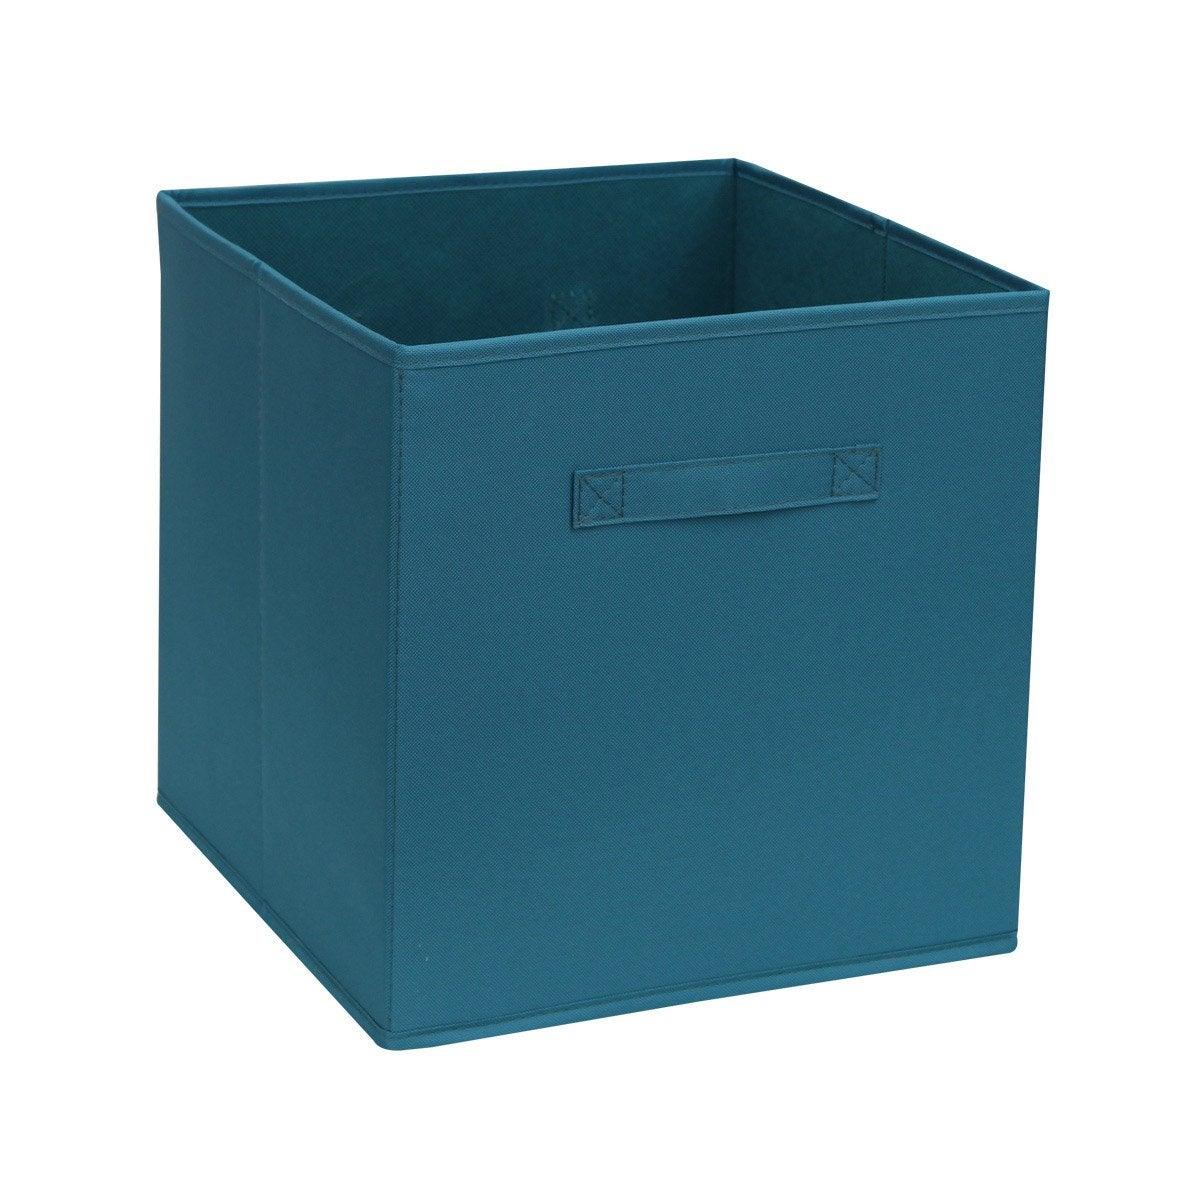 bo te de rangement bleu x x cm leroy merlin. Black Bedroom Furniture Sets. Home Design Ideas